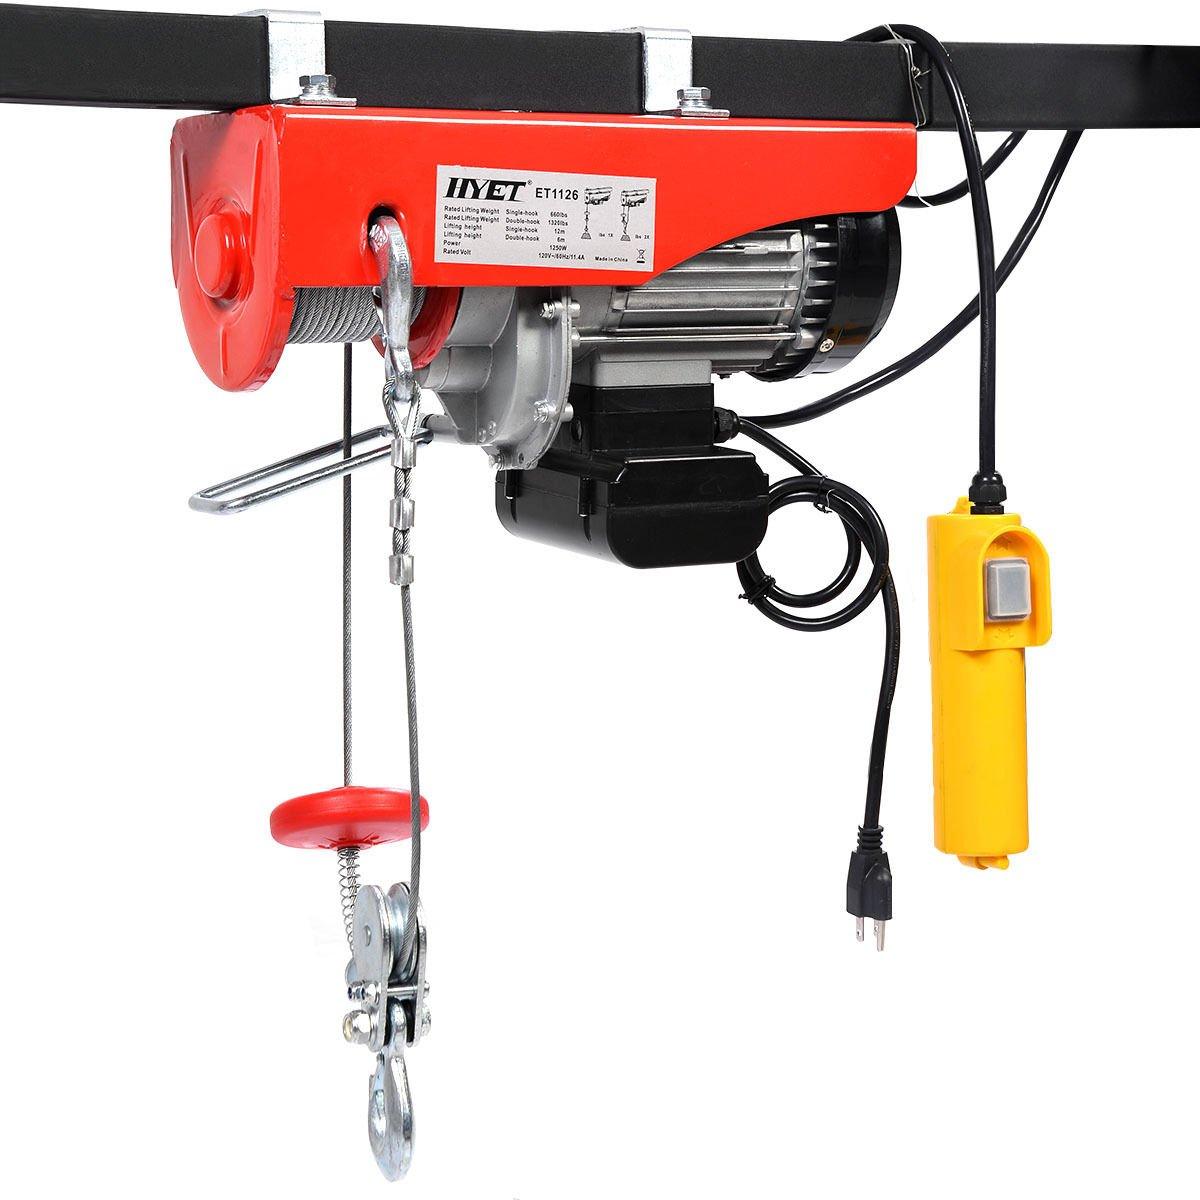 Goplus Lift Electric Hoist Garage Auto Shop Electric Wire Hoist Overhead Lift w/ Remote Control (1320LBS)